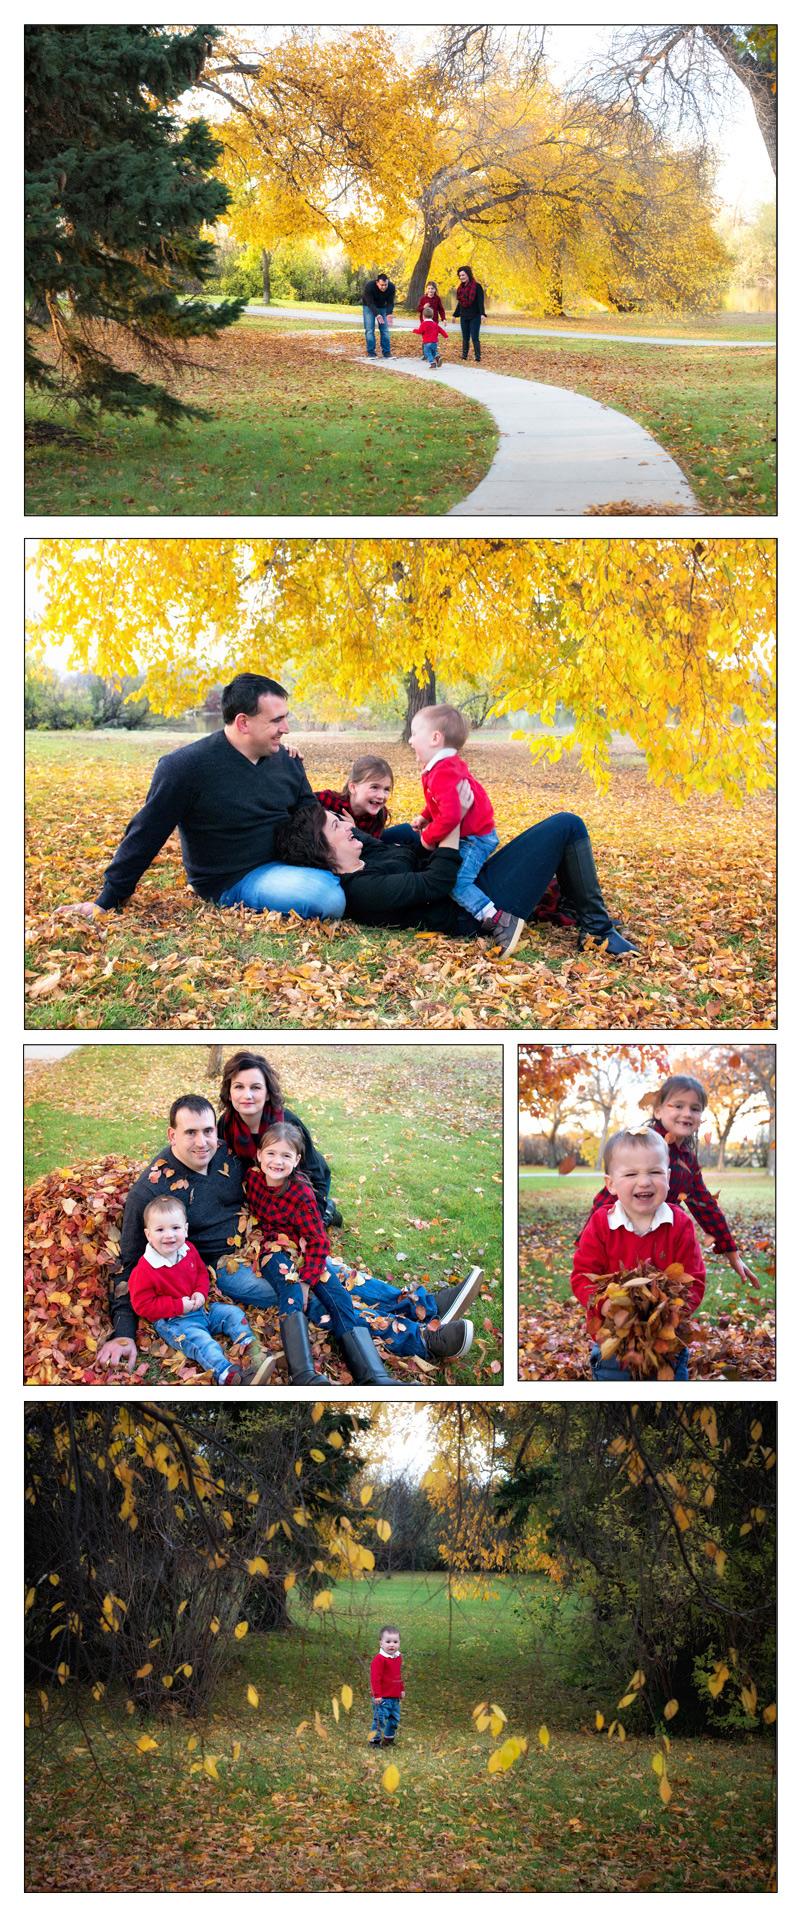 regina-family-photgrapher-free-lense-photo-04.jpg